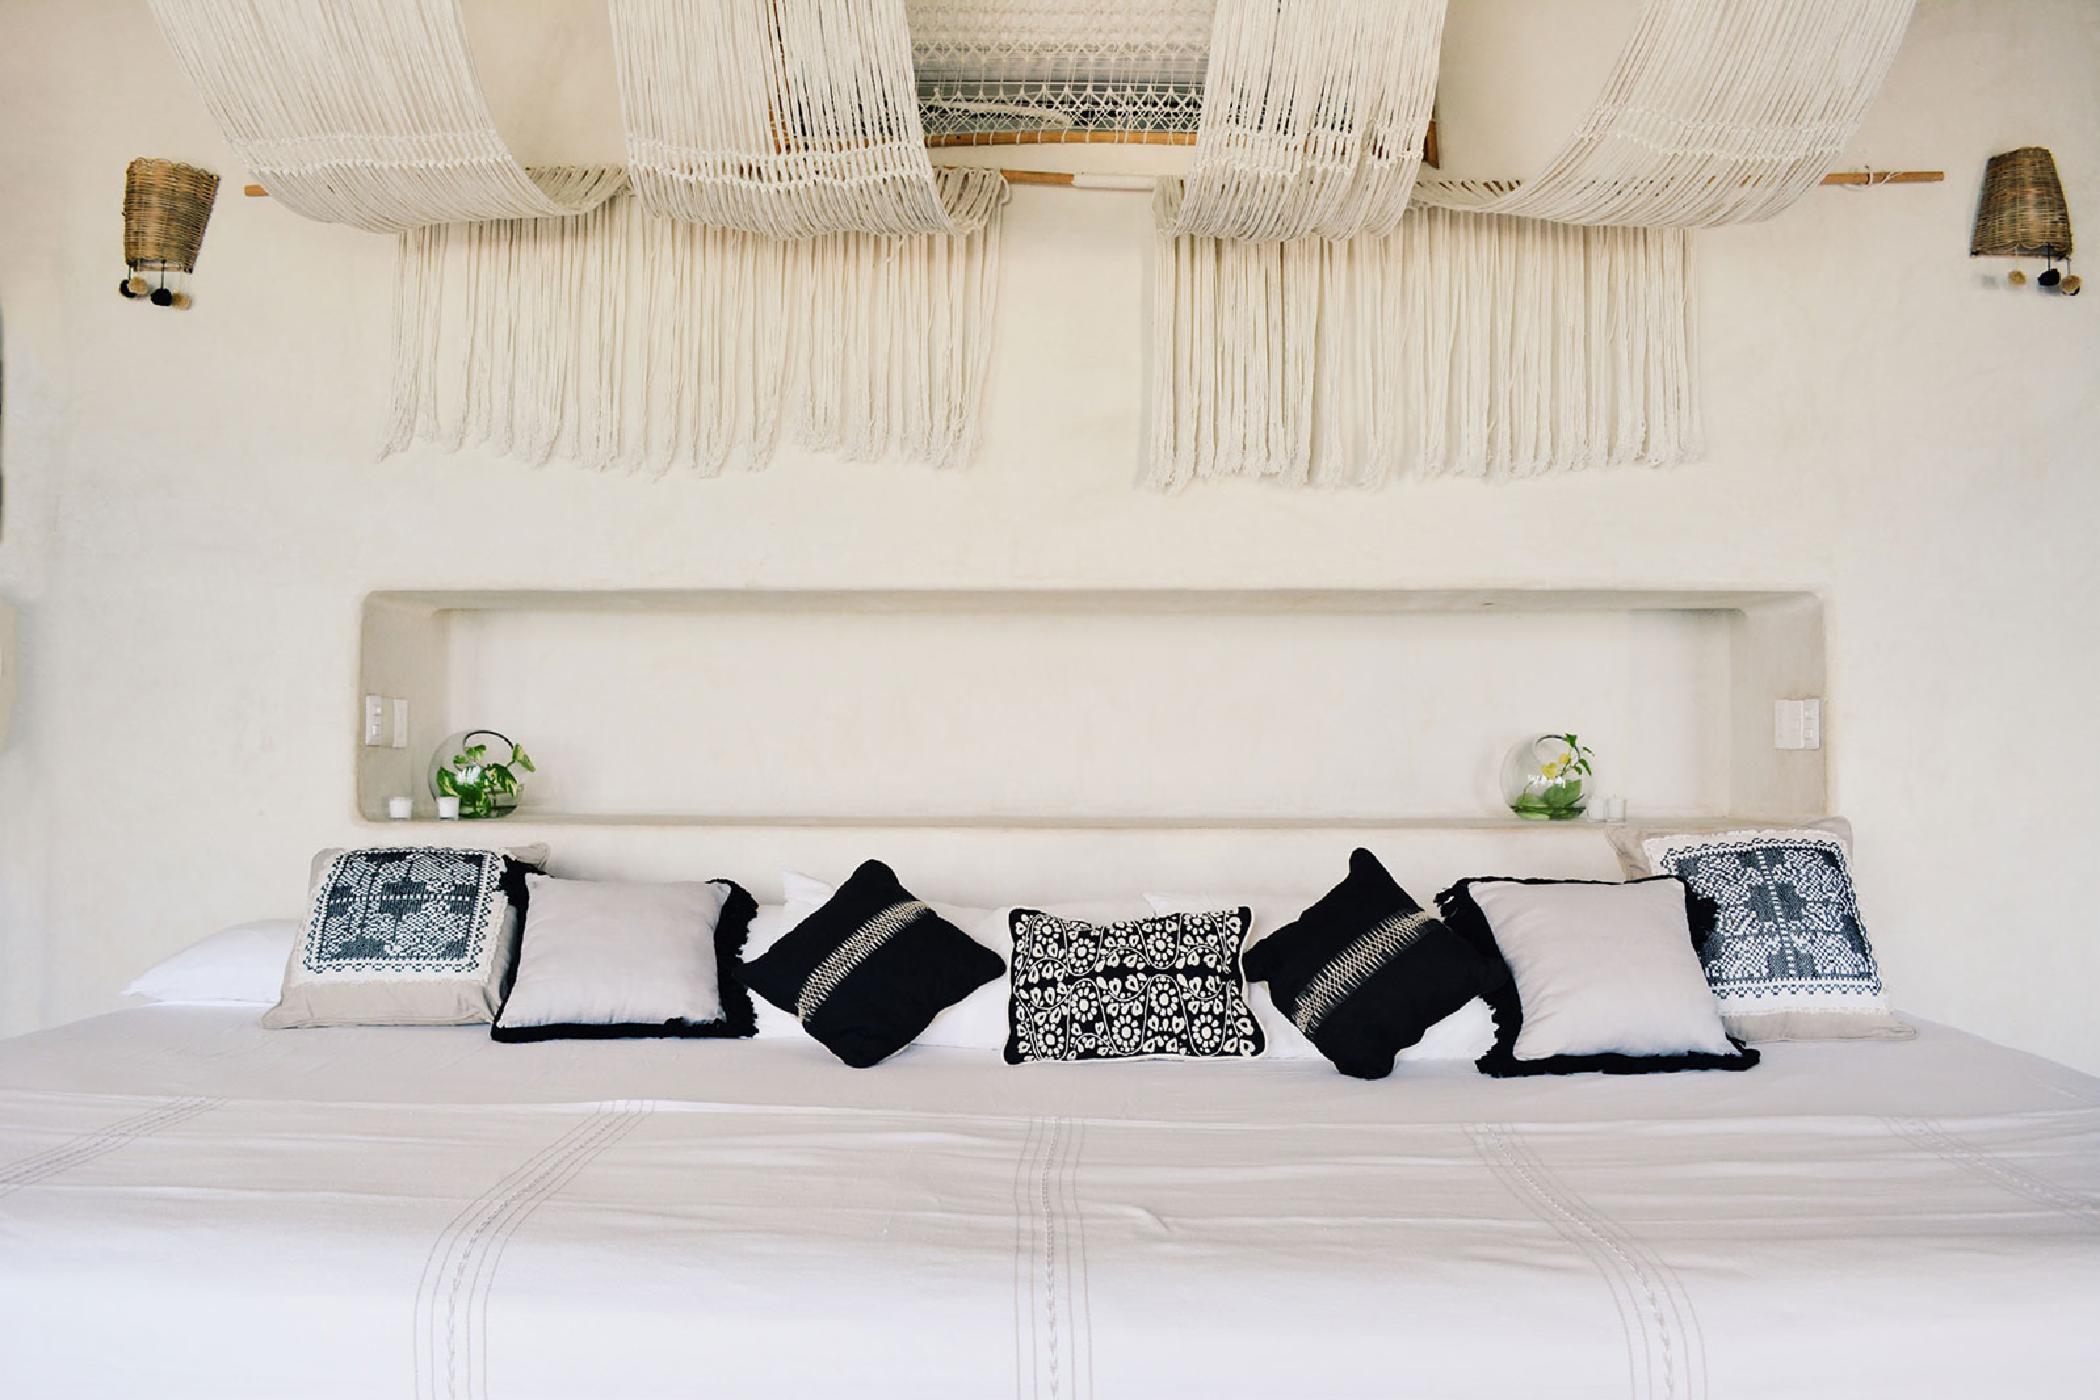 Maya_Luxe_Riviera_Maya_Luxury_Villas_Experiences_Hotel_Zone_Tulum_Beach_5_Bedrooms_Casa_Palapa_14.jpg